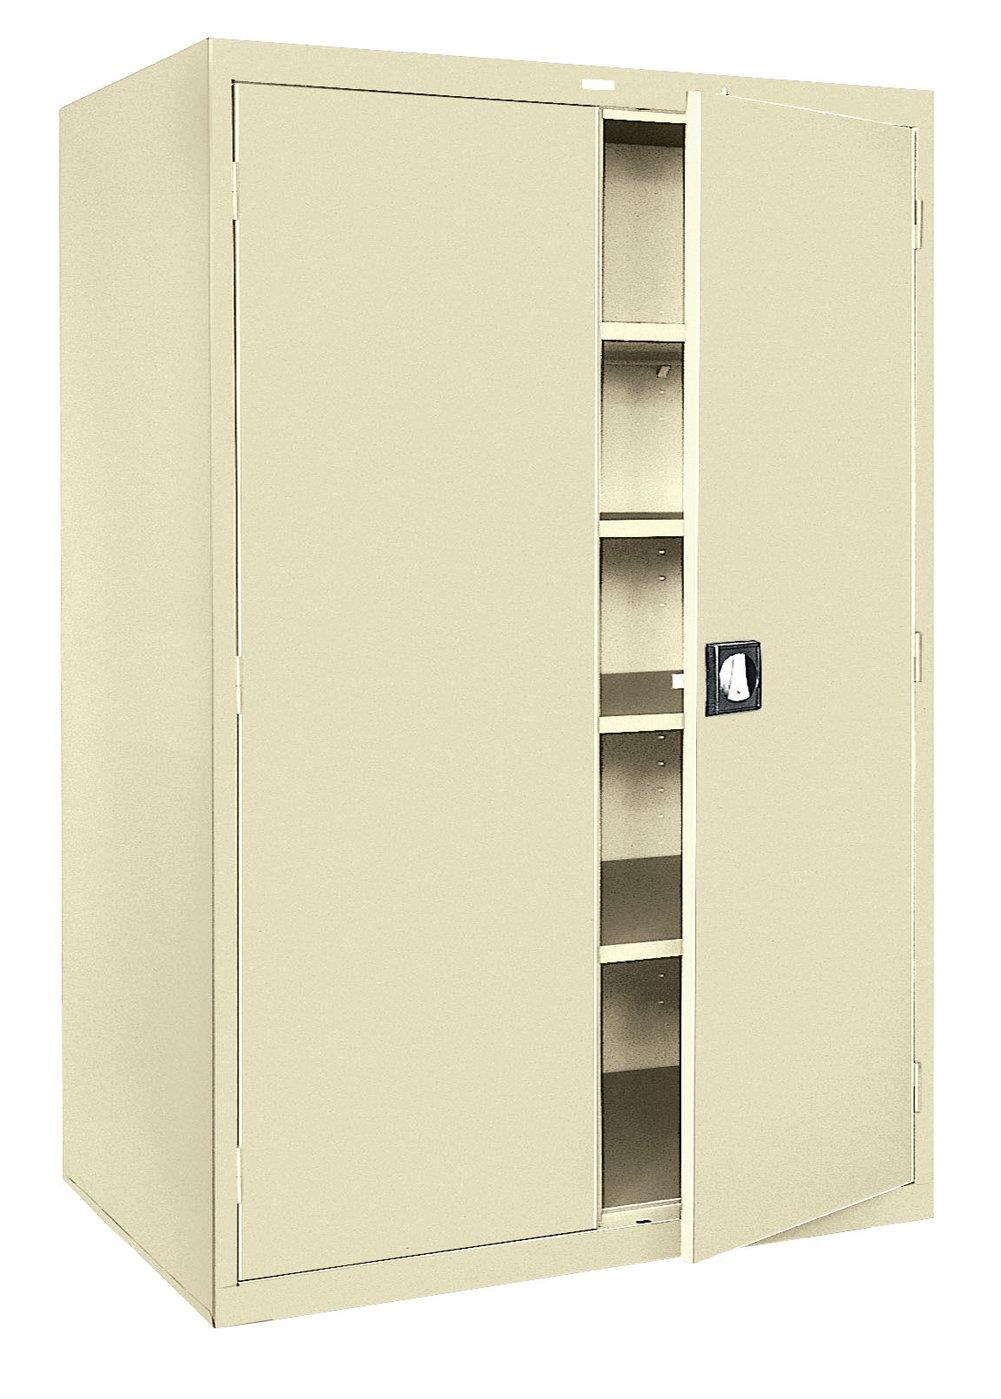 Sandusky Lee KDE7848-07 Putty Steel Powder Coat SnapIt Storage Cabinet, Keyless Electronic Coded Lock, 4 Adjustable Shelves, 78 Height x 48 Width x 24 Depth